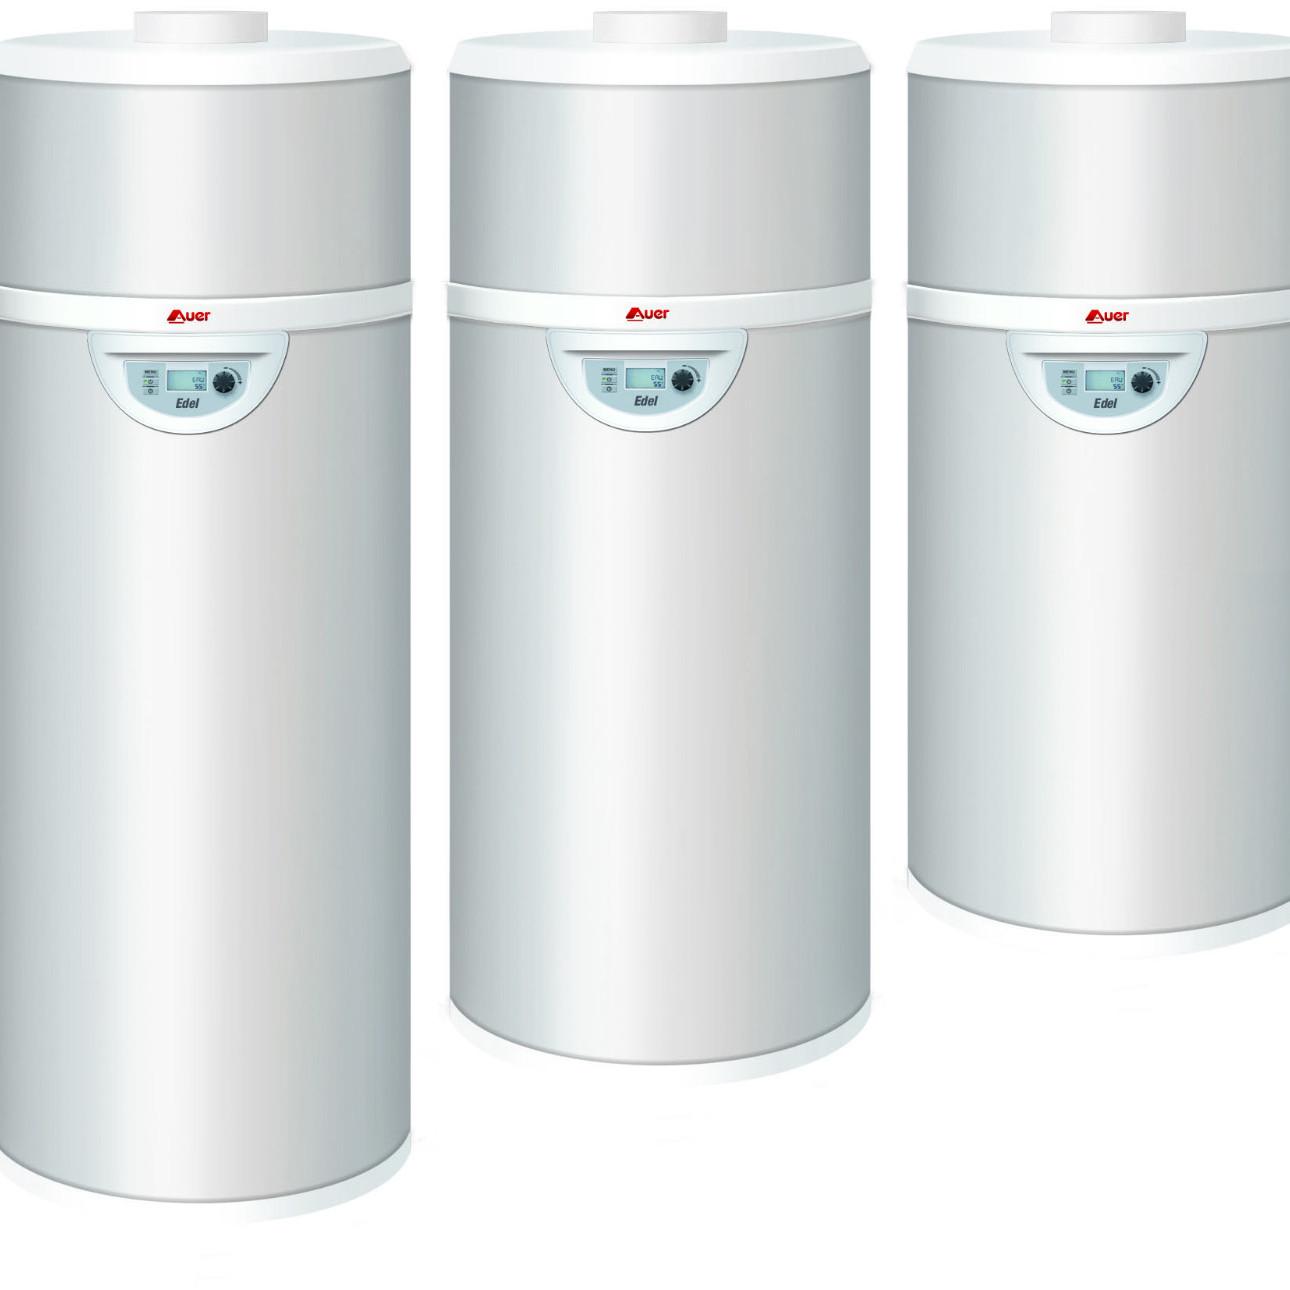 Chauffe eau solaire douai